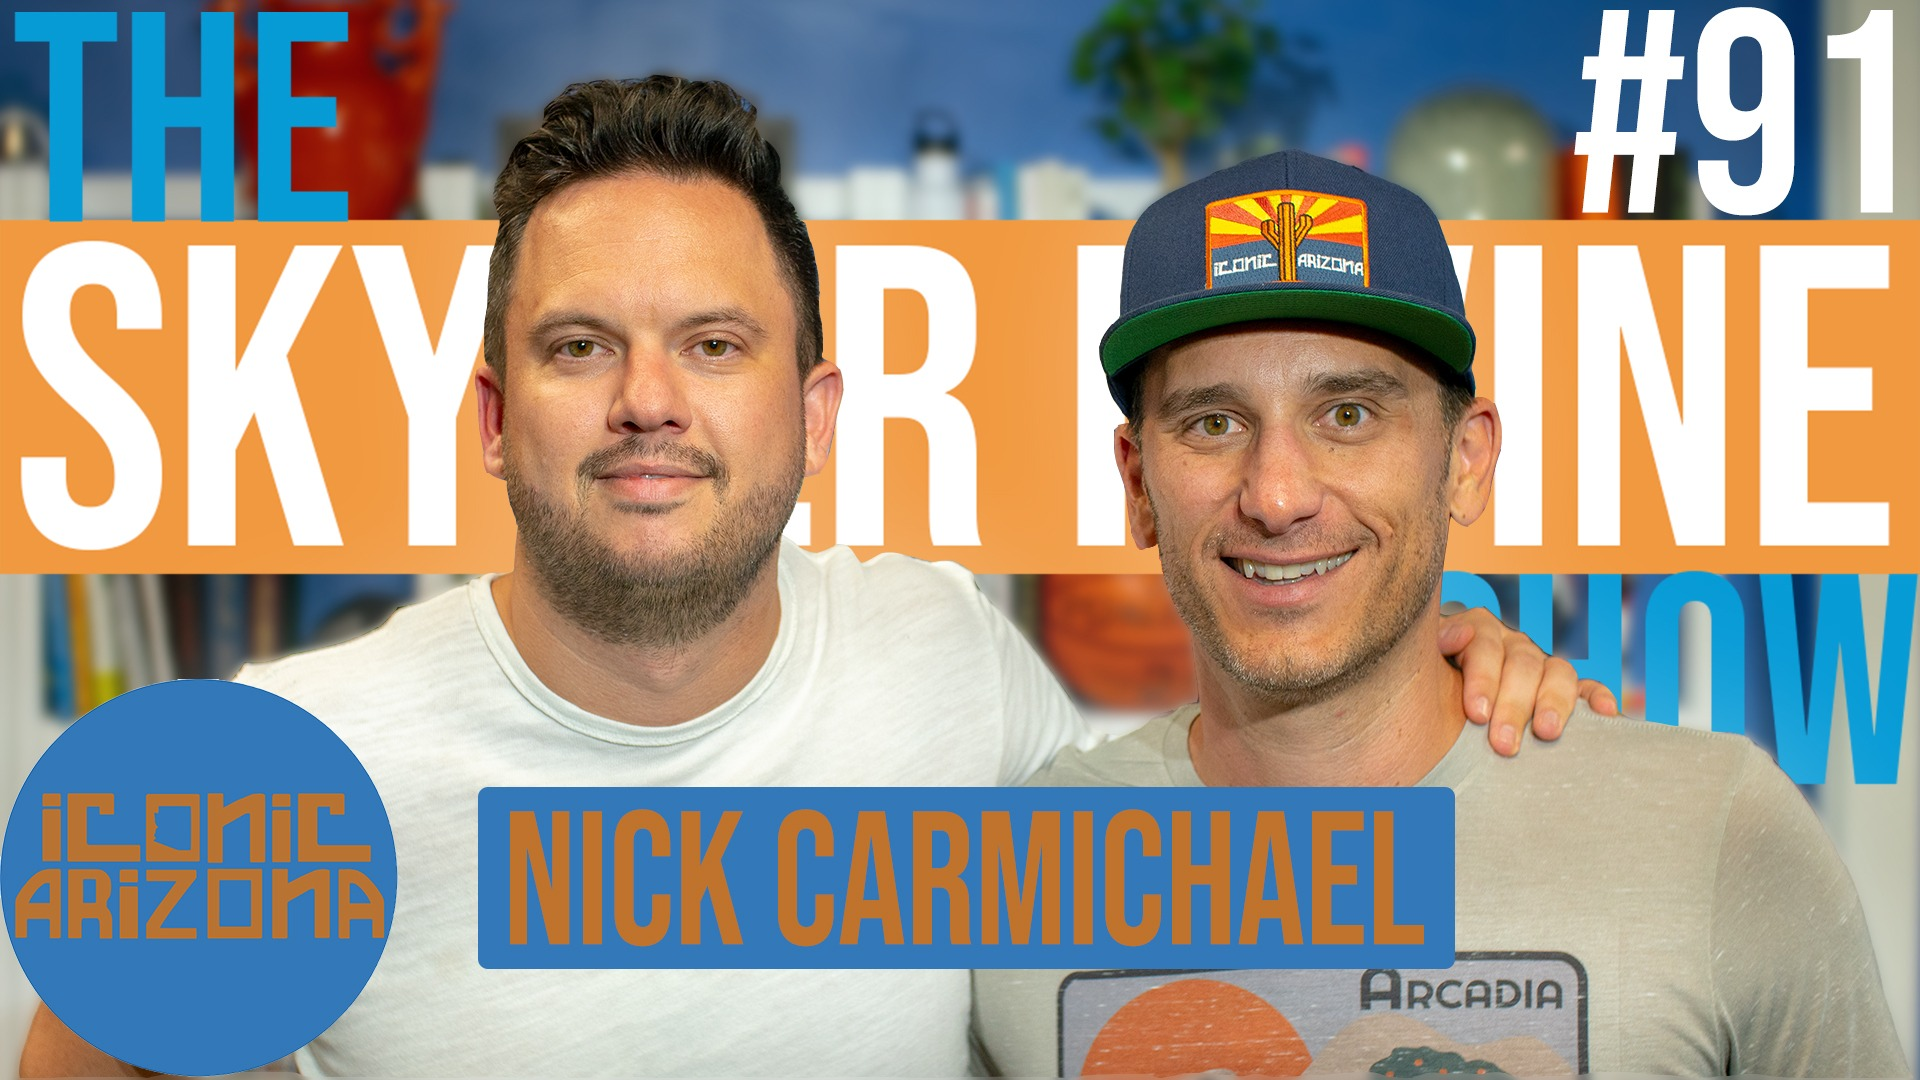 Nick Carmichael on The SKYLER IRVINE Show